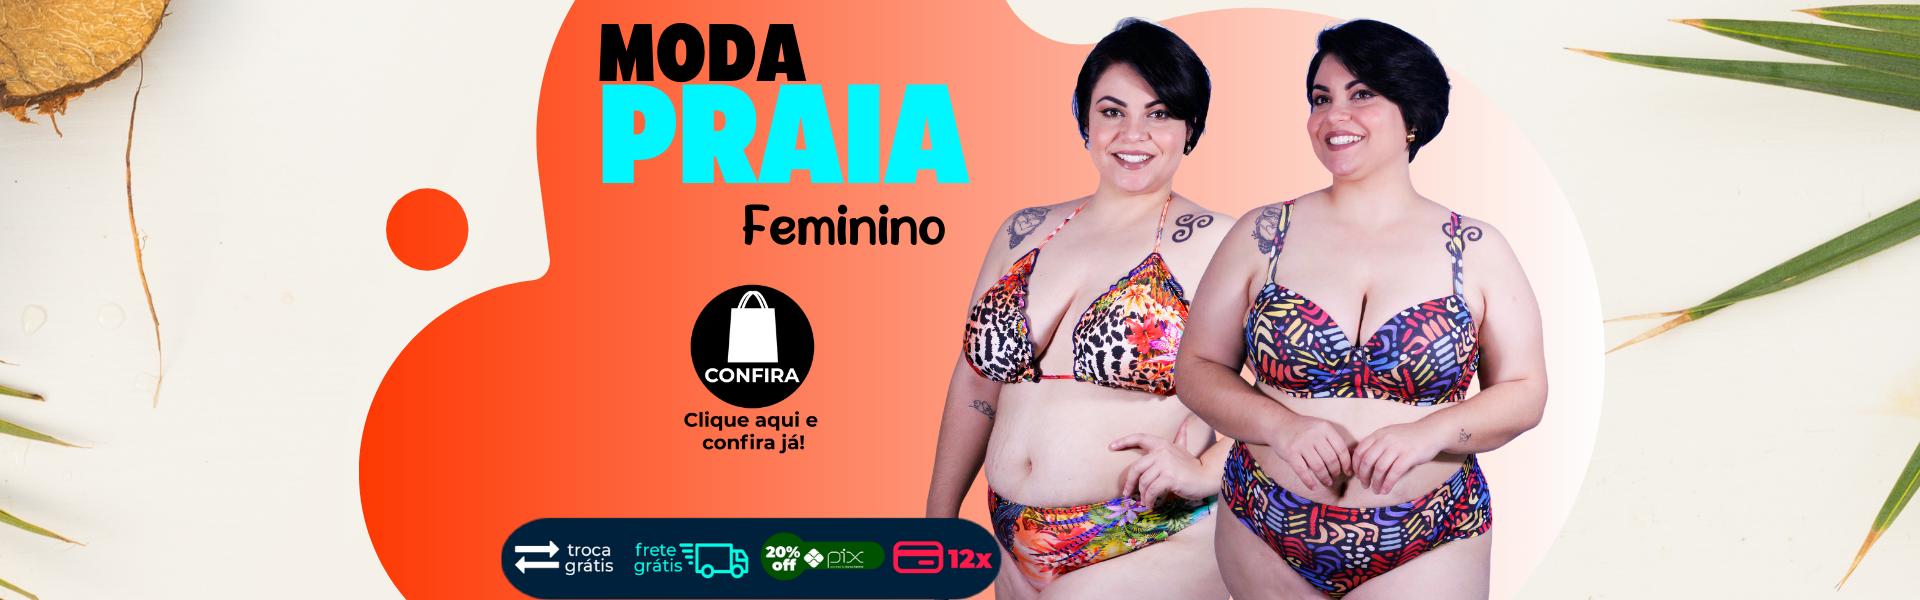 MODA PRAIA FEMININO 03-09